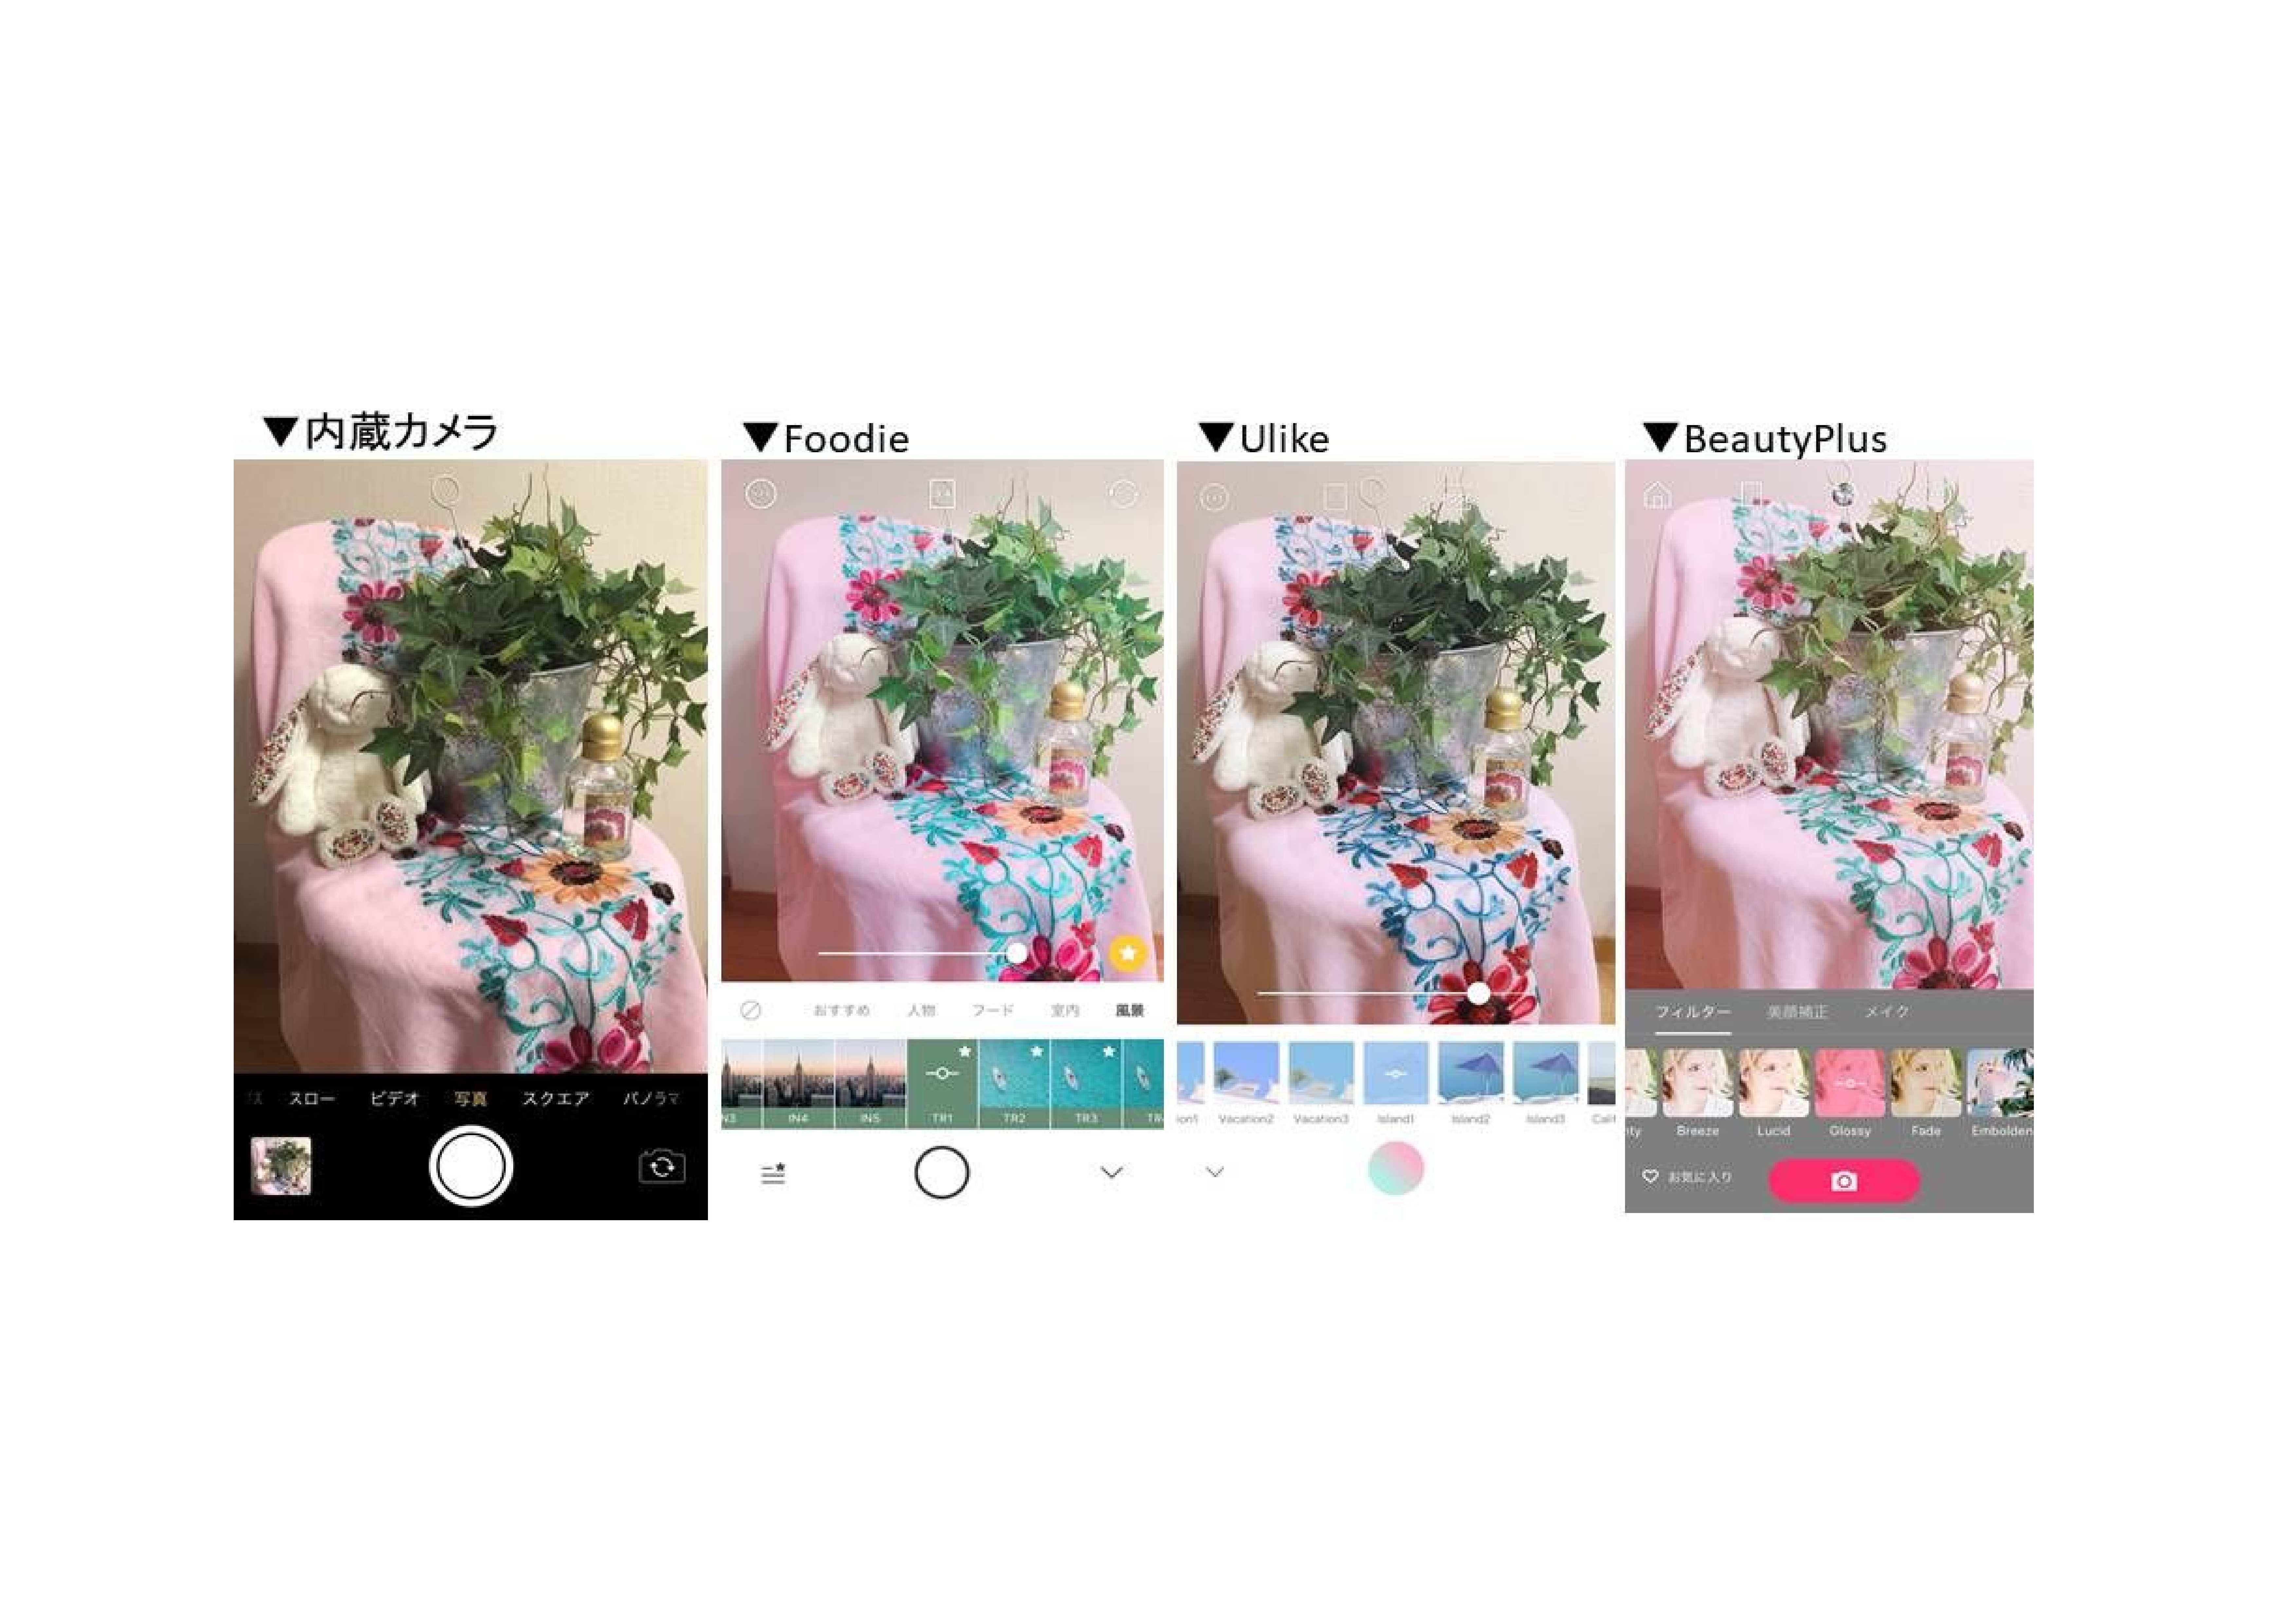 【Foodie/Ulike/BeautyPlus】カメラアプリ比較(インテリア)